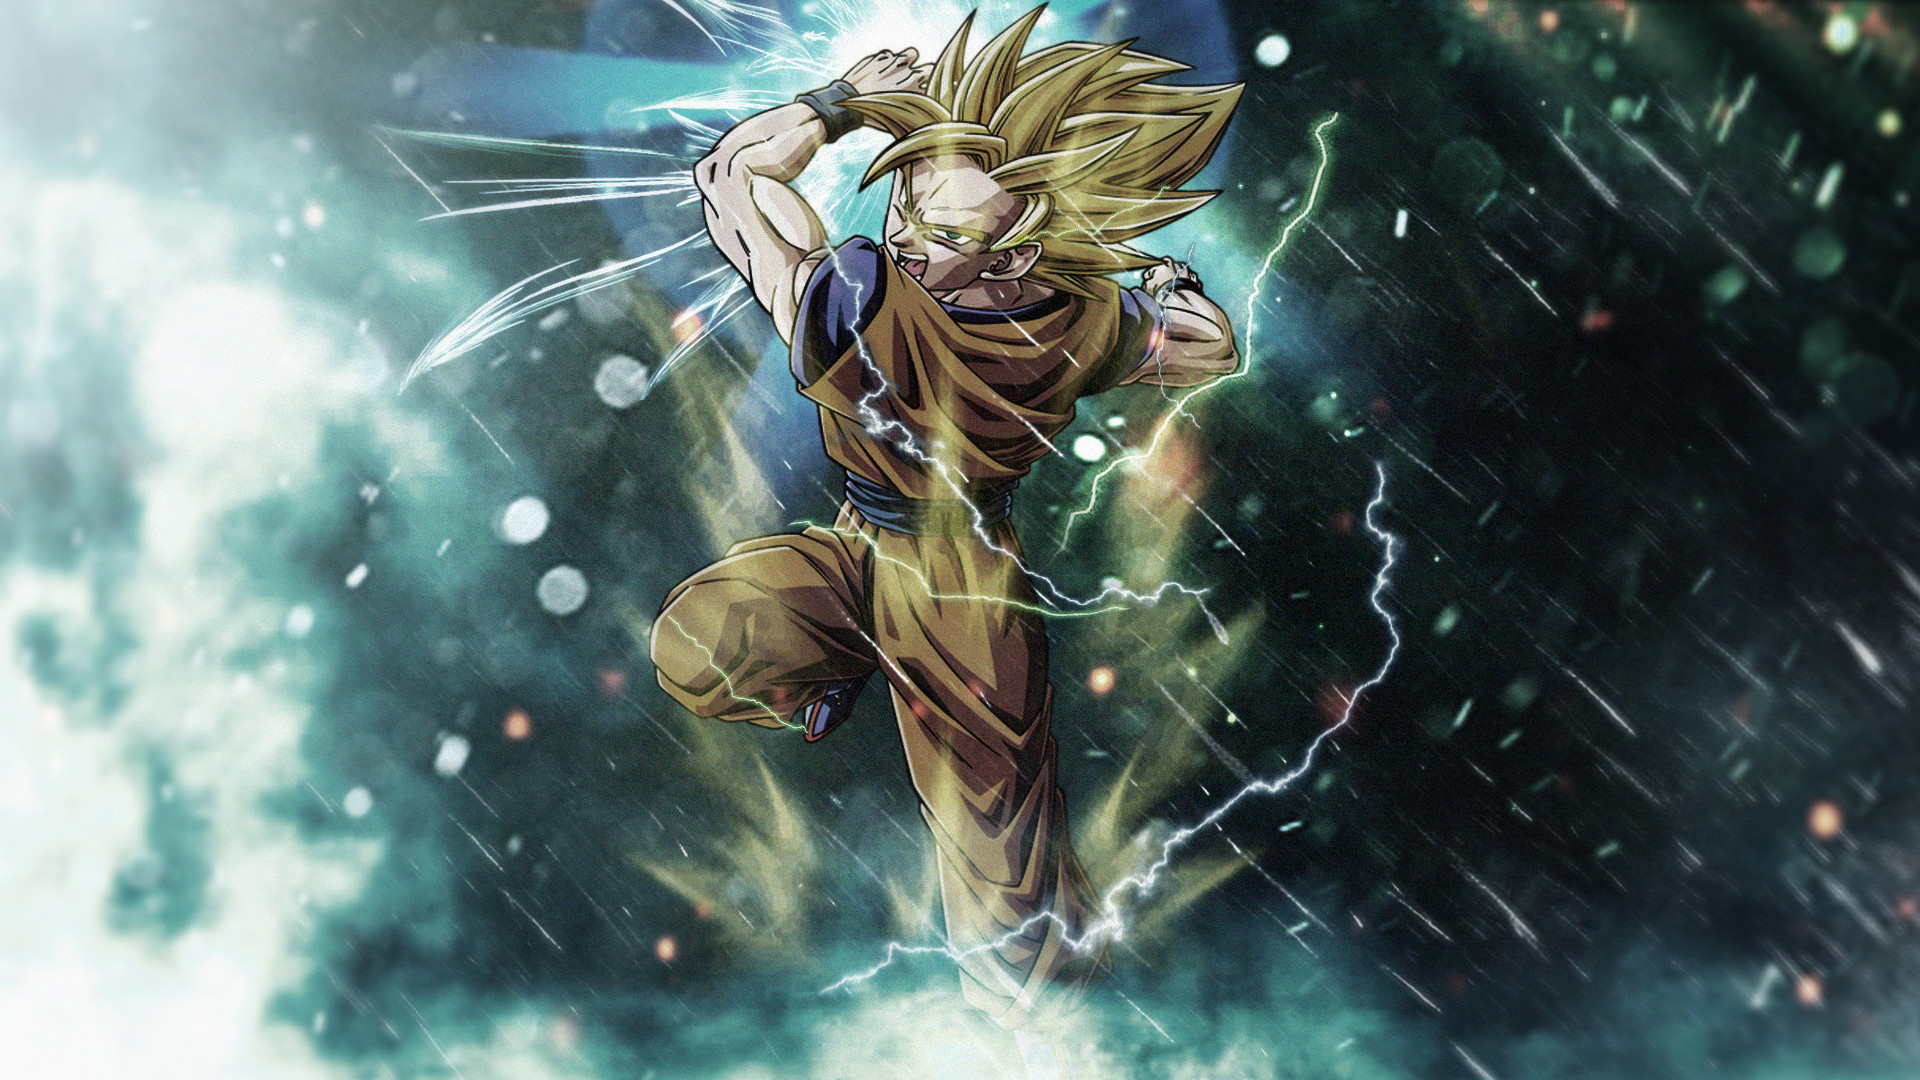 Dragon Ball Z Goku Wallpaper 72 Pictures